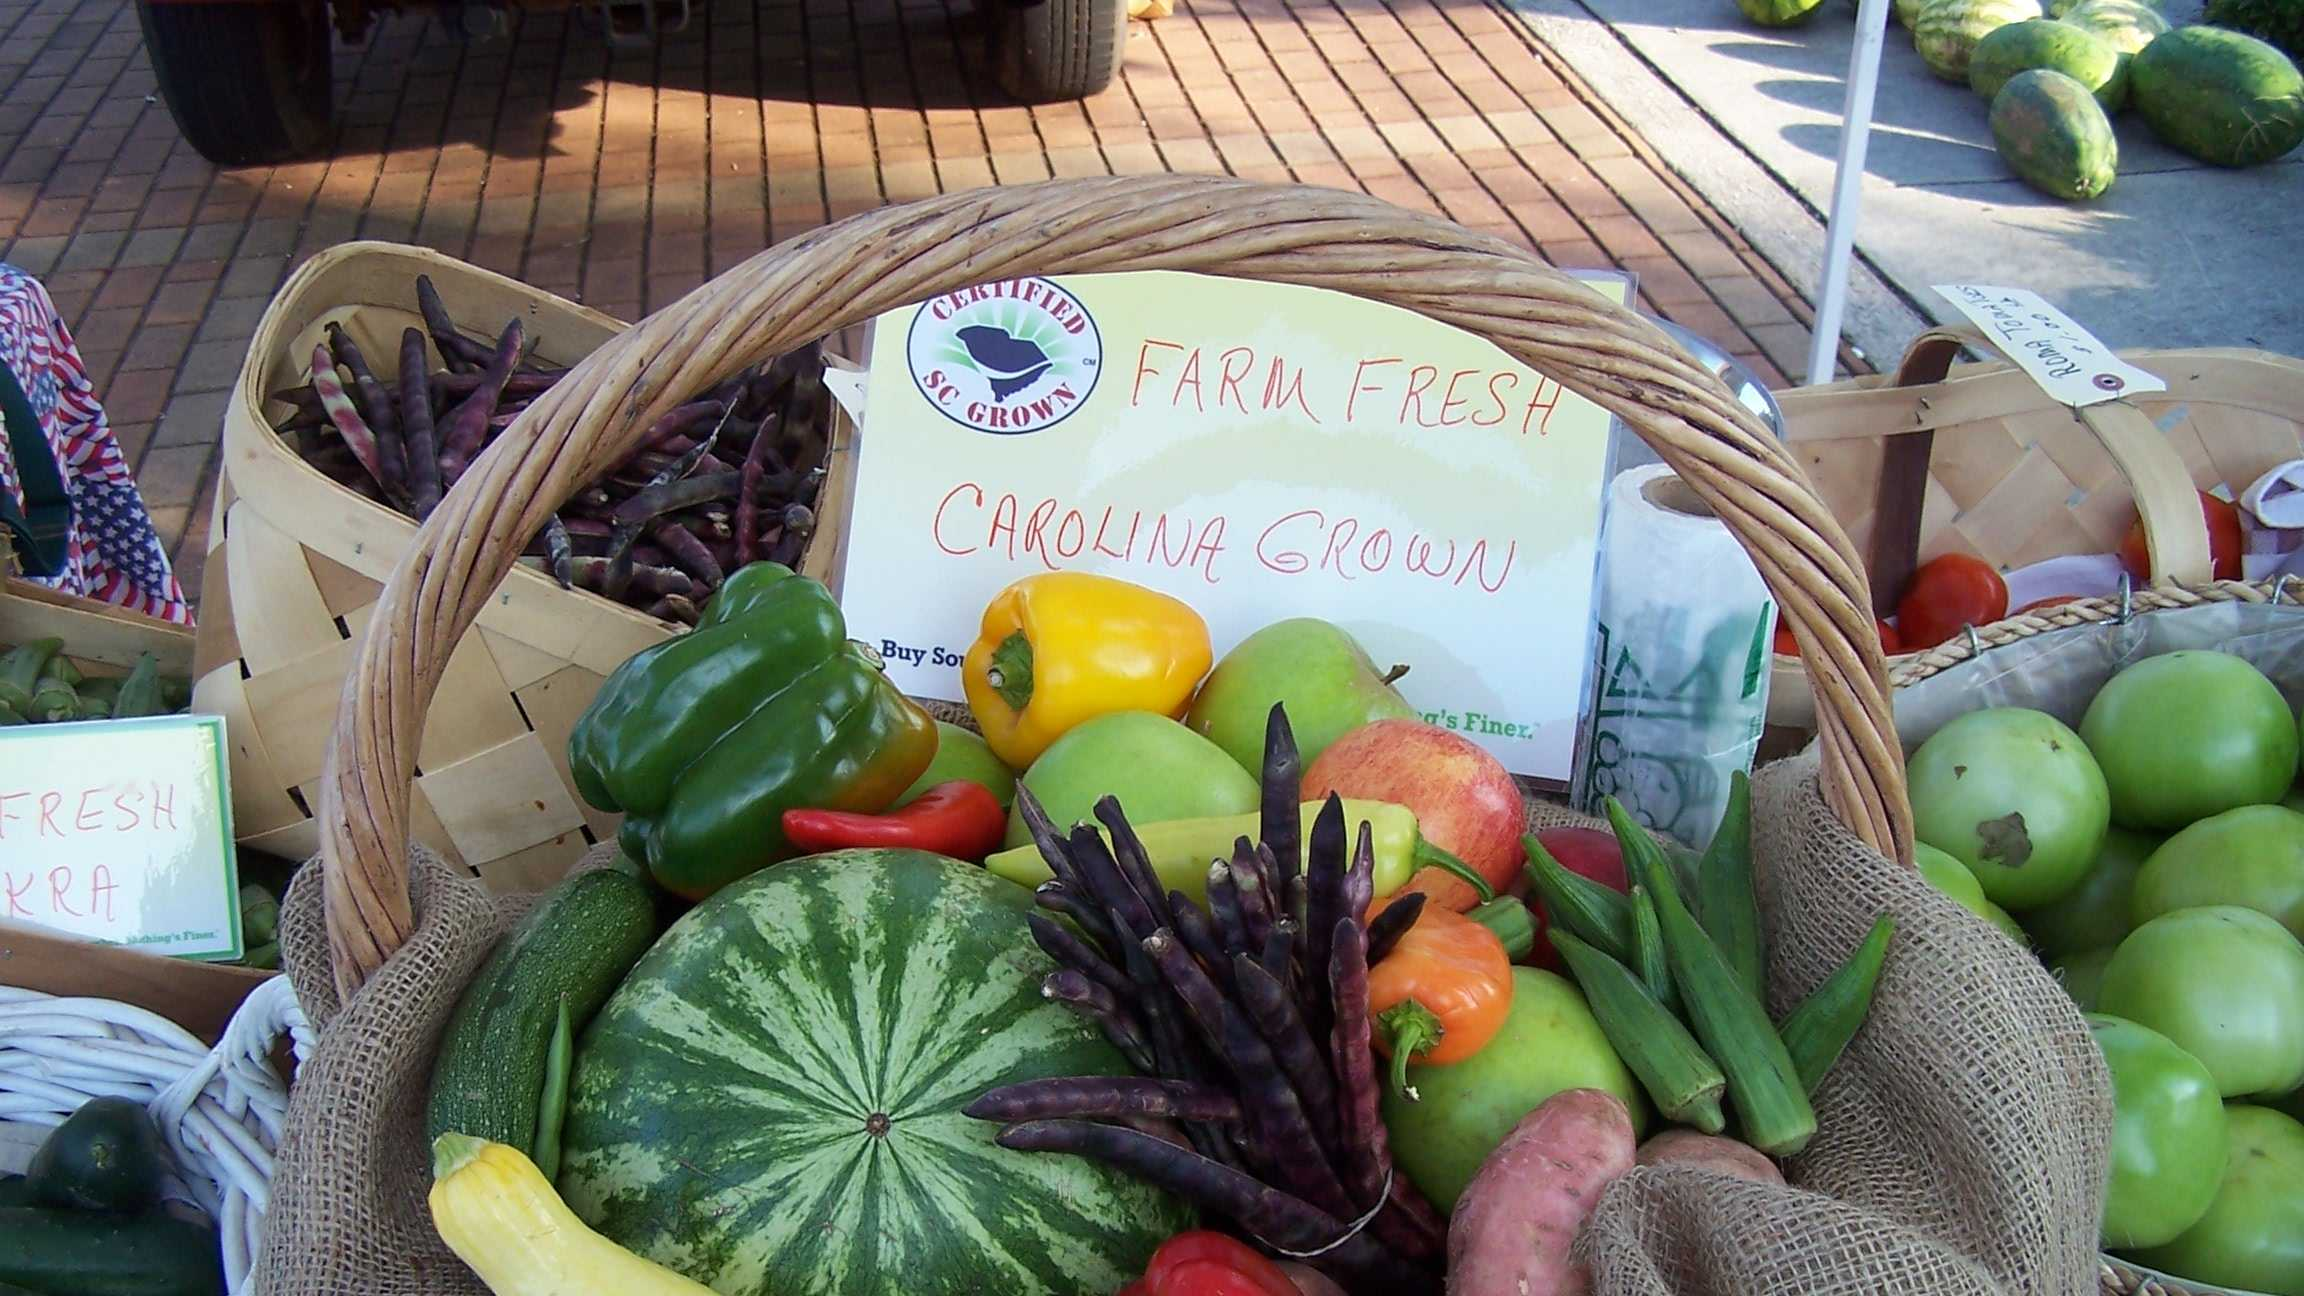 Spartanburg farmer's market